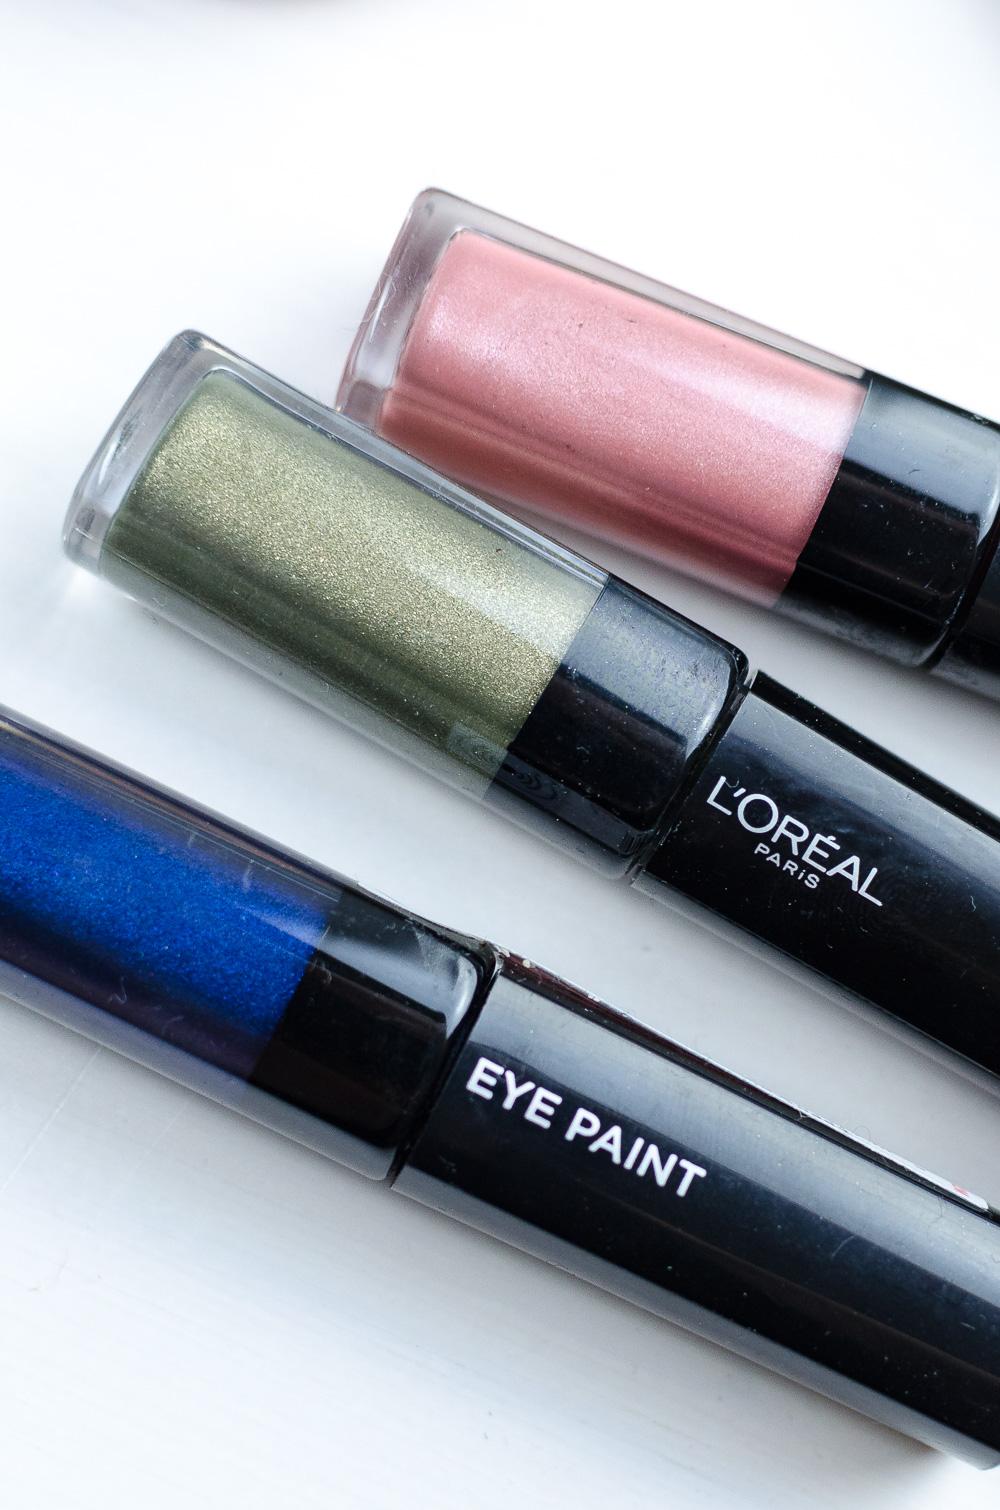 Beautyblog-Deutschland-Beauty-Influencer-Andrea-Funk-andysparkles-Berlin-Loreal-Paris-Eye-Paint-Rainbow-Lips-Lip-Laquer